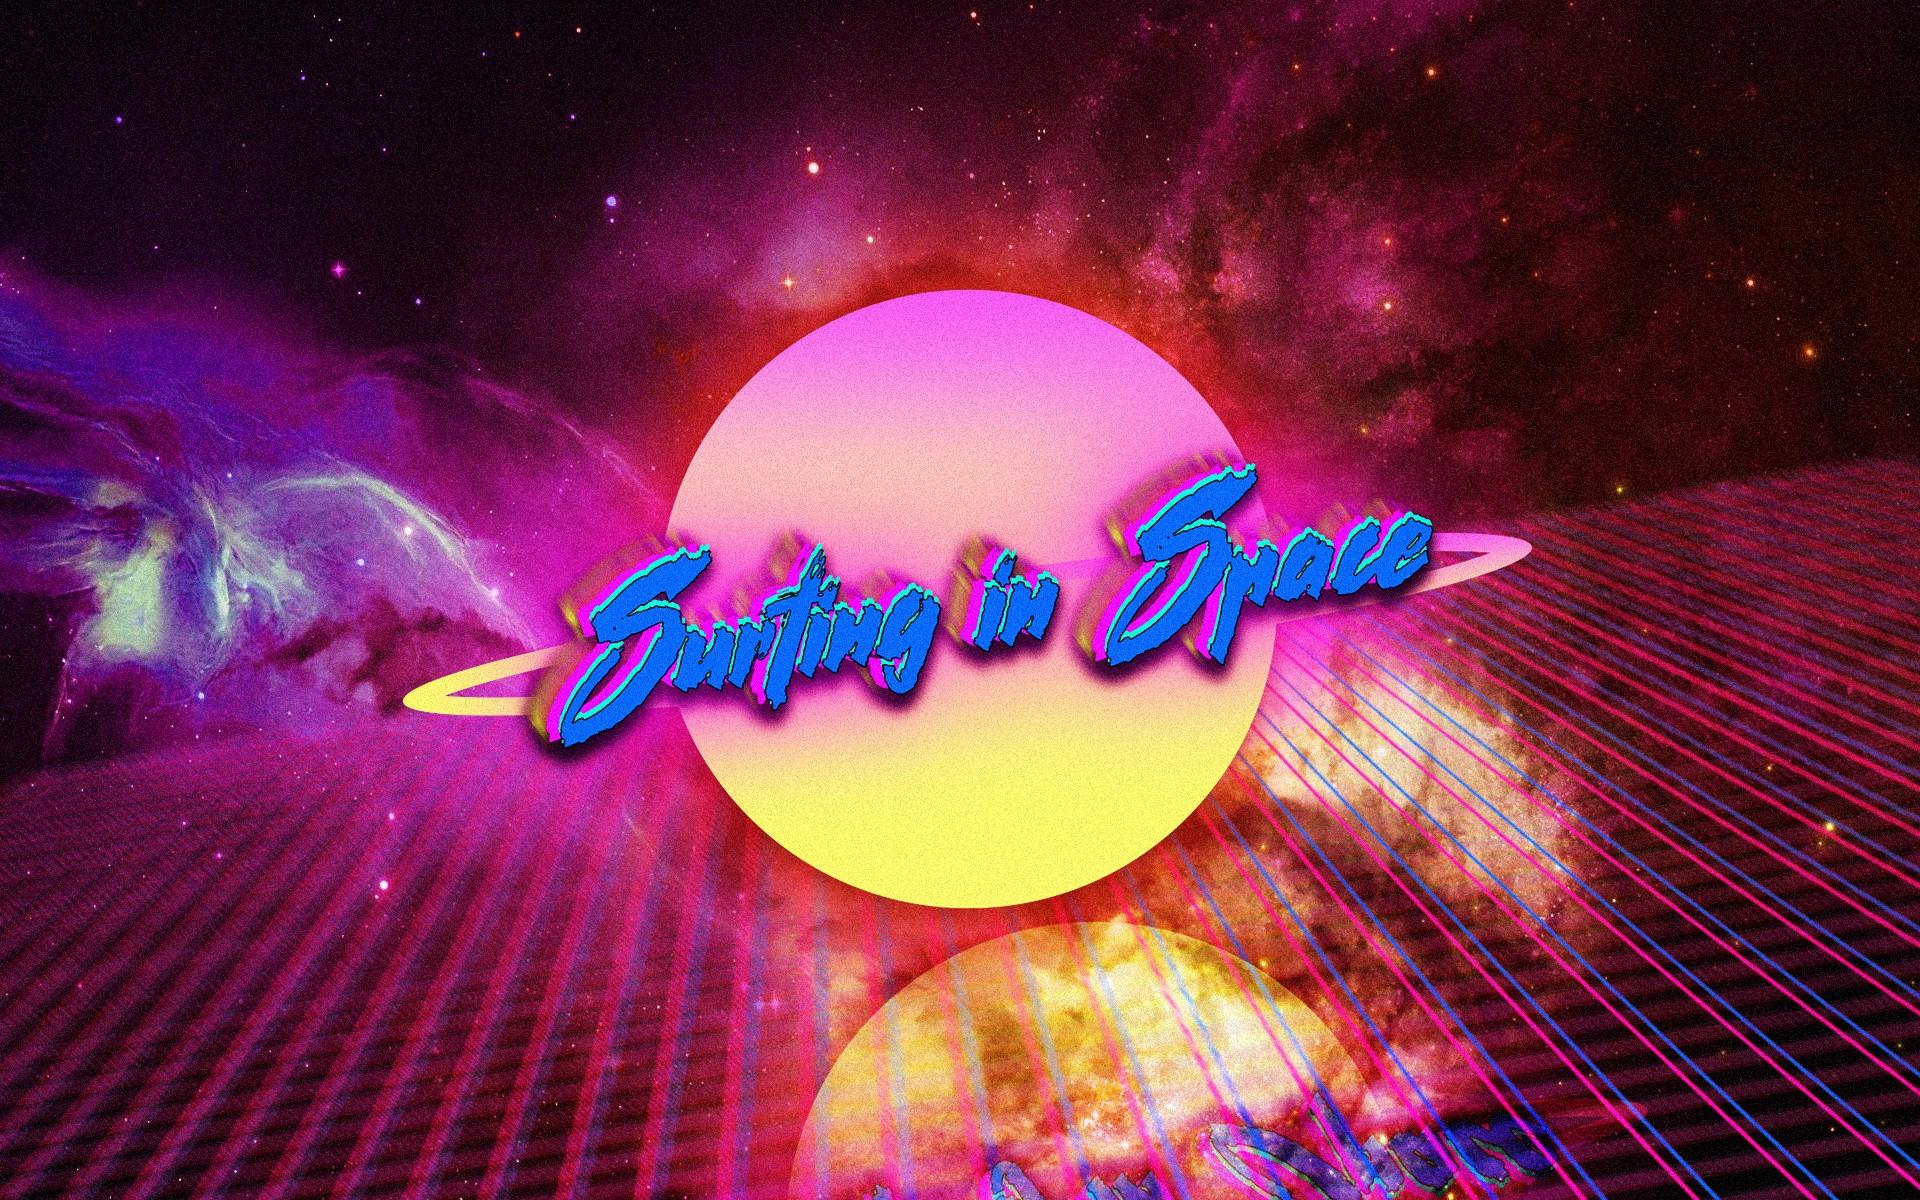 Wallpaper : illustration, digital art, neon, typography, Retro style, vintage, universe, color ...